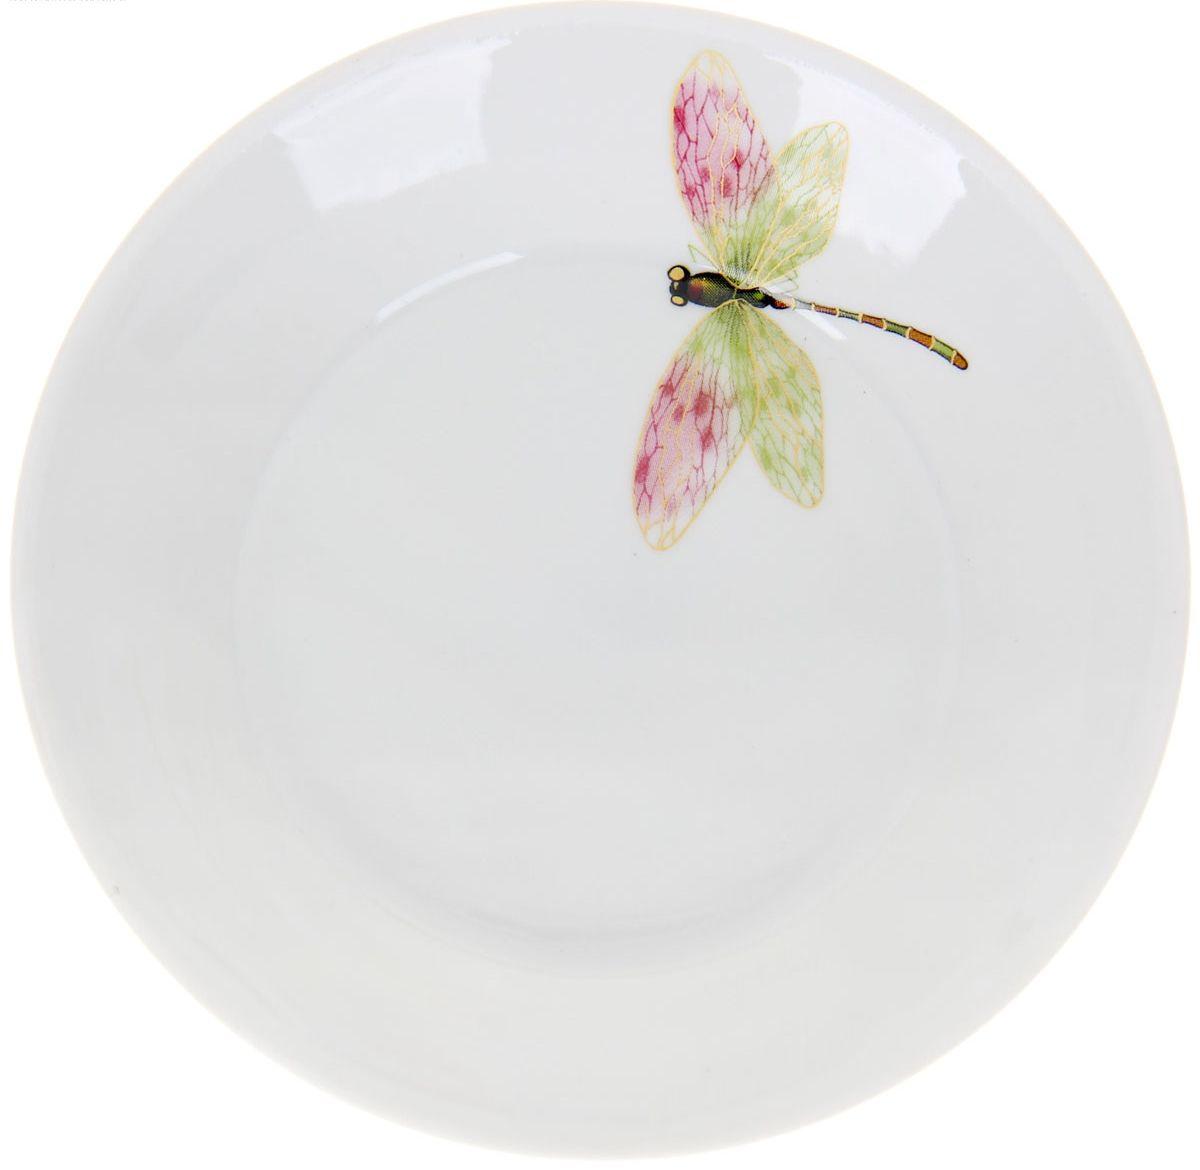 Блюдце Стрекоза, диаметр 14 см1224495